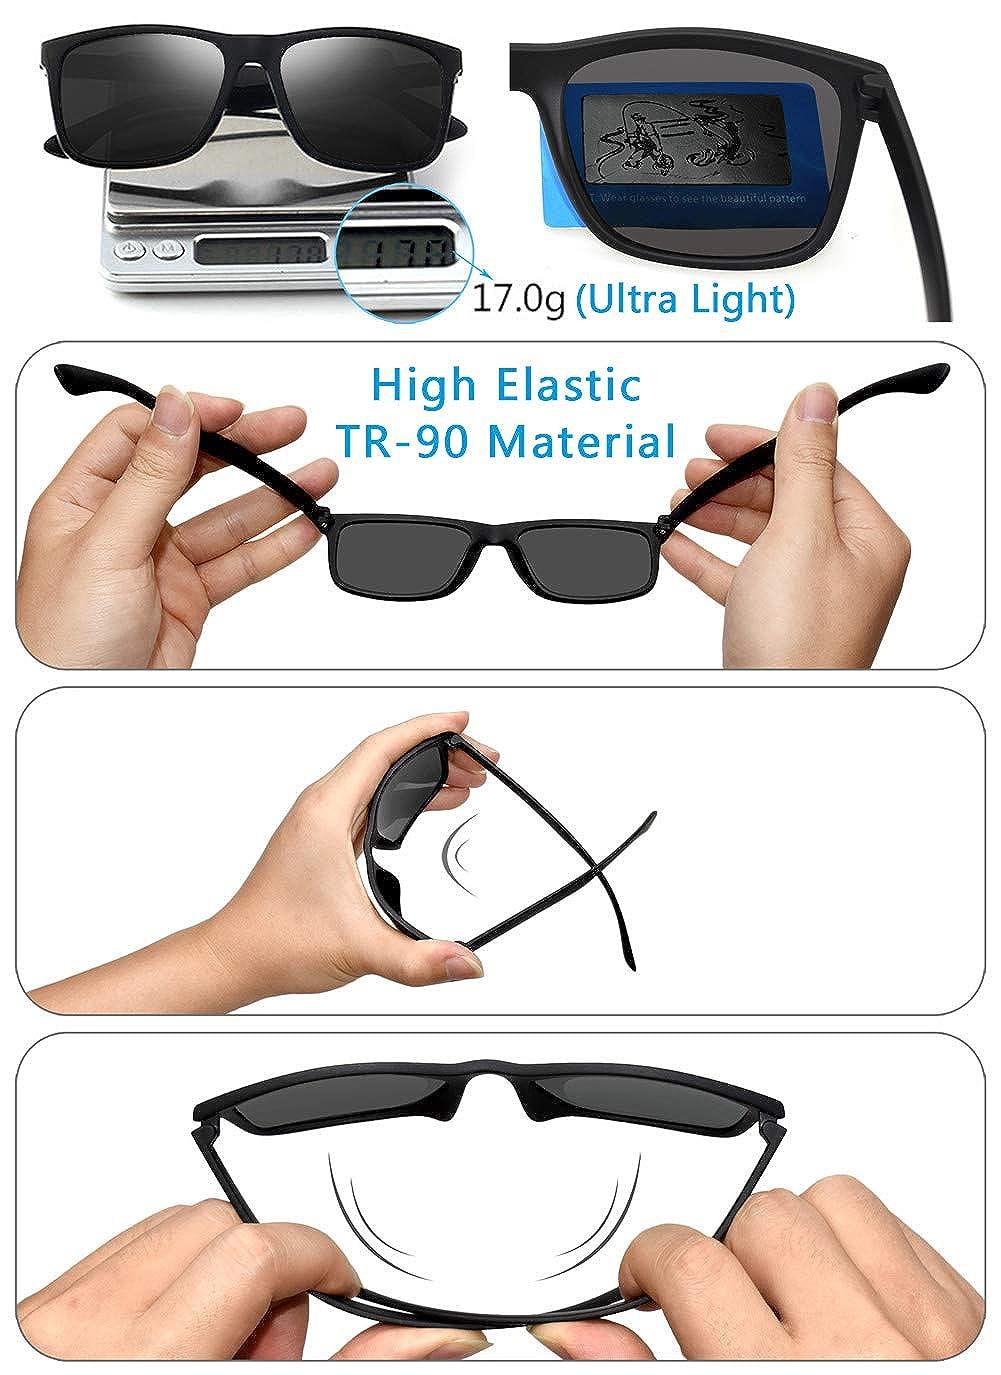 Amazon.com: Gafas de sol polarizadas para hombre, TR90 ...